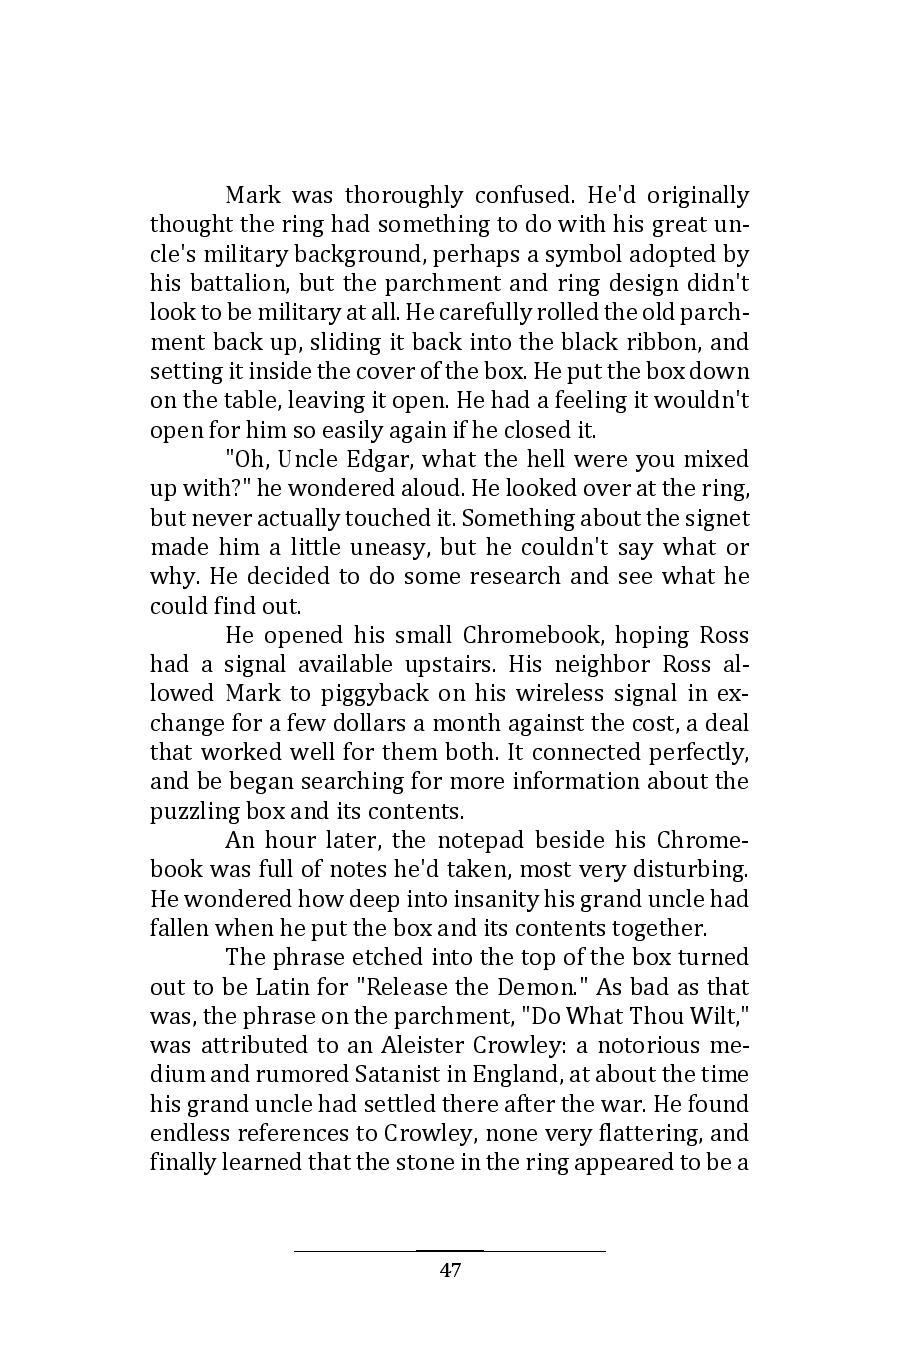 Hinnom Magazine 001 Manuscript 10-page-051